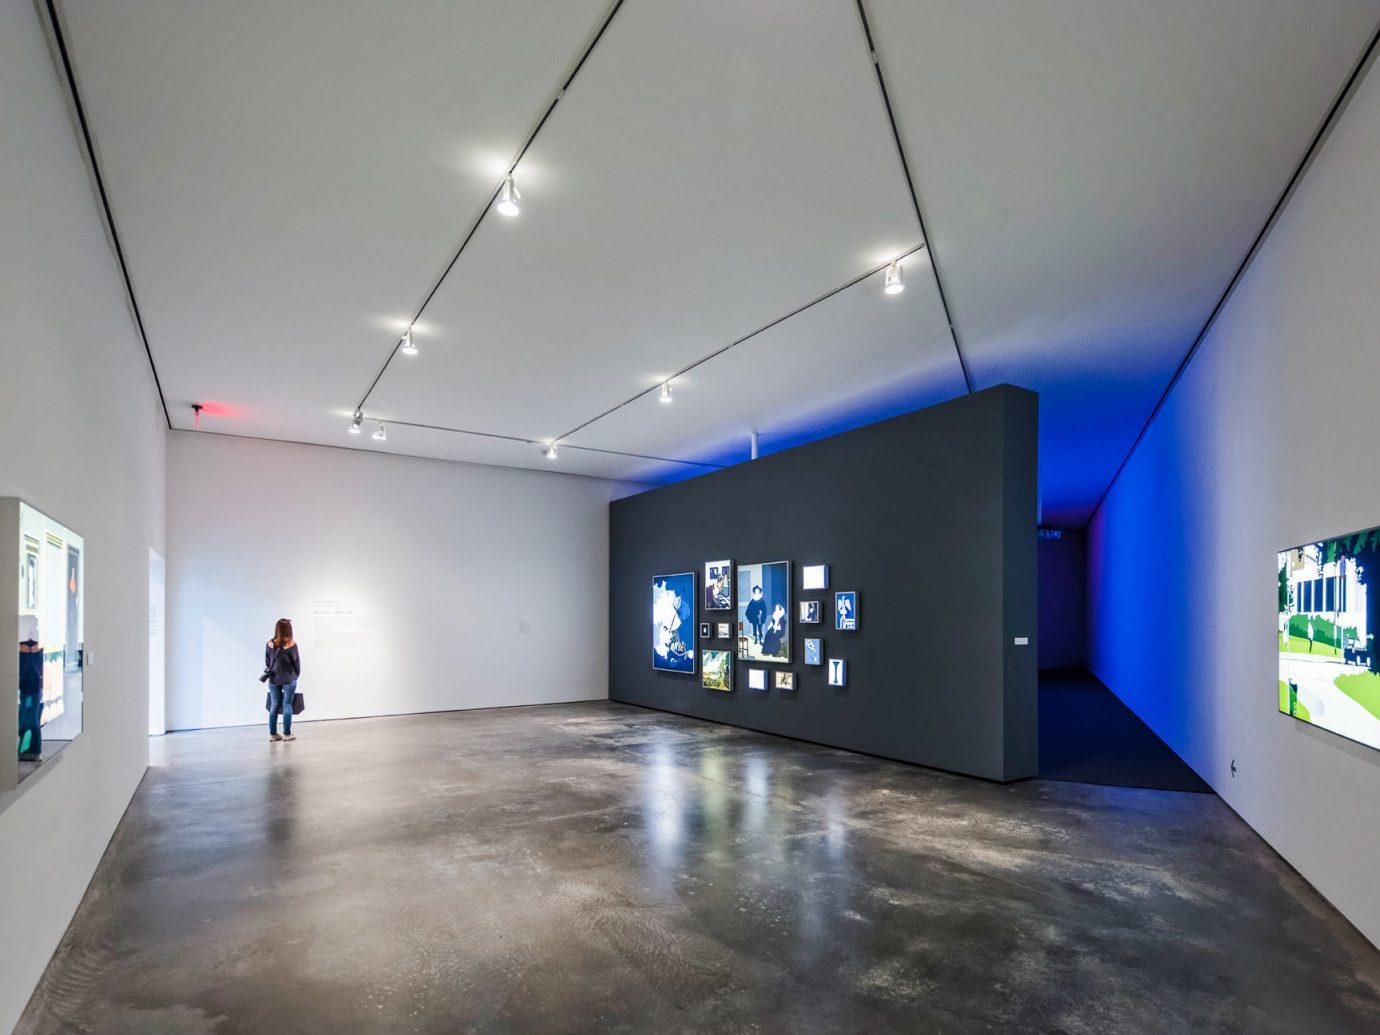 exhibition tourist attraction art gallery museum interior design daylighting space ceiling art exhibition